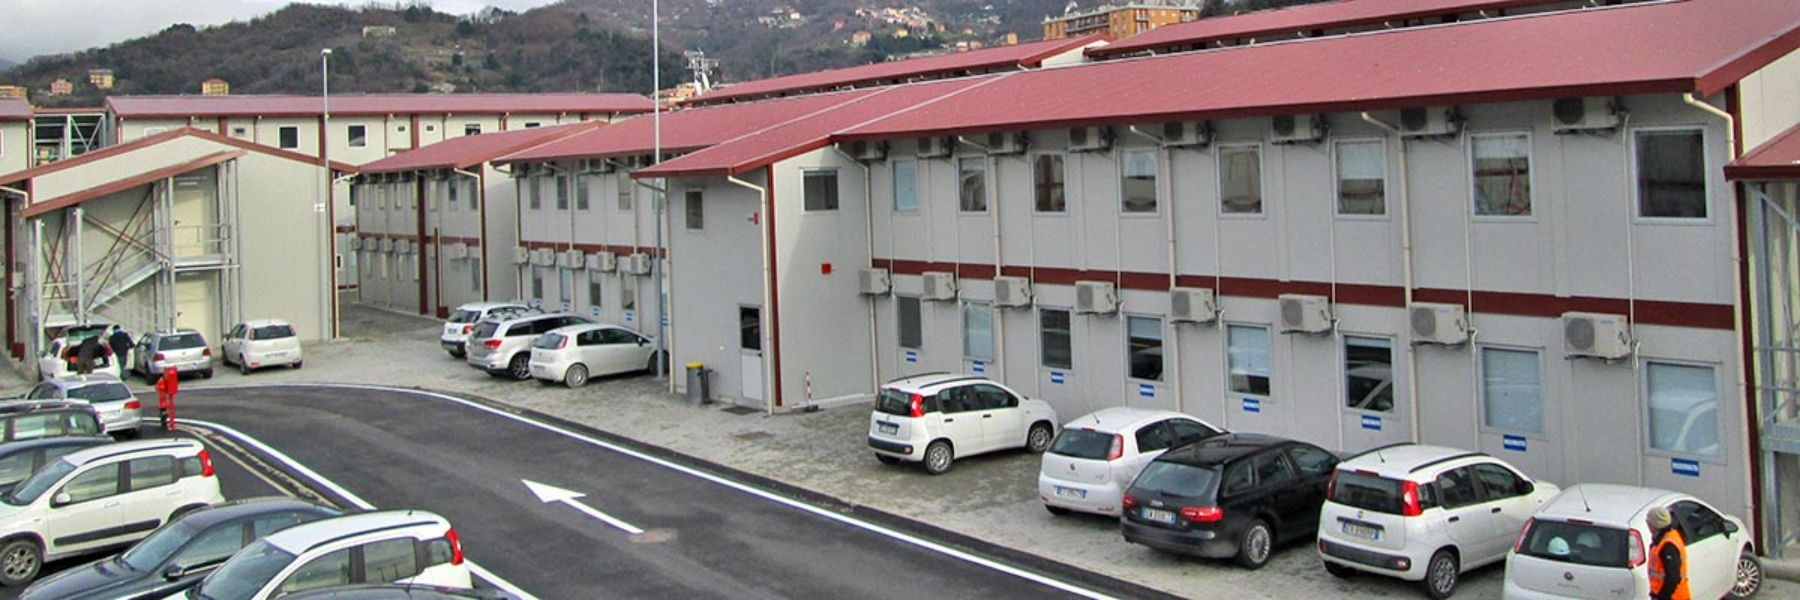 """Alta Velocità Milano-Genova (COCIV)"" | MI GE slide 01"